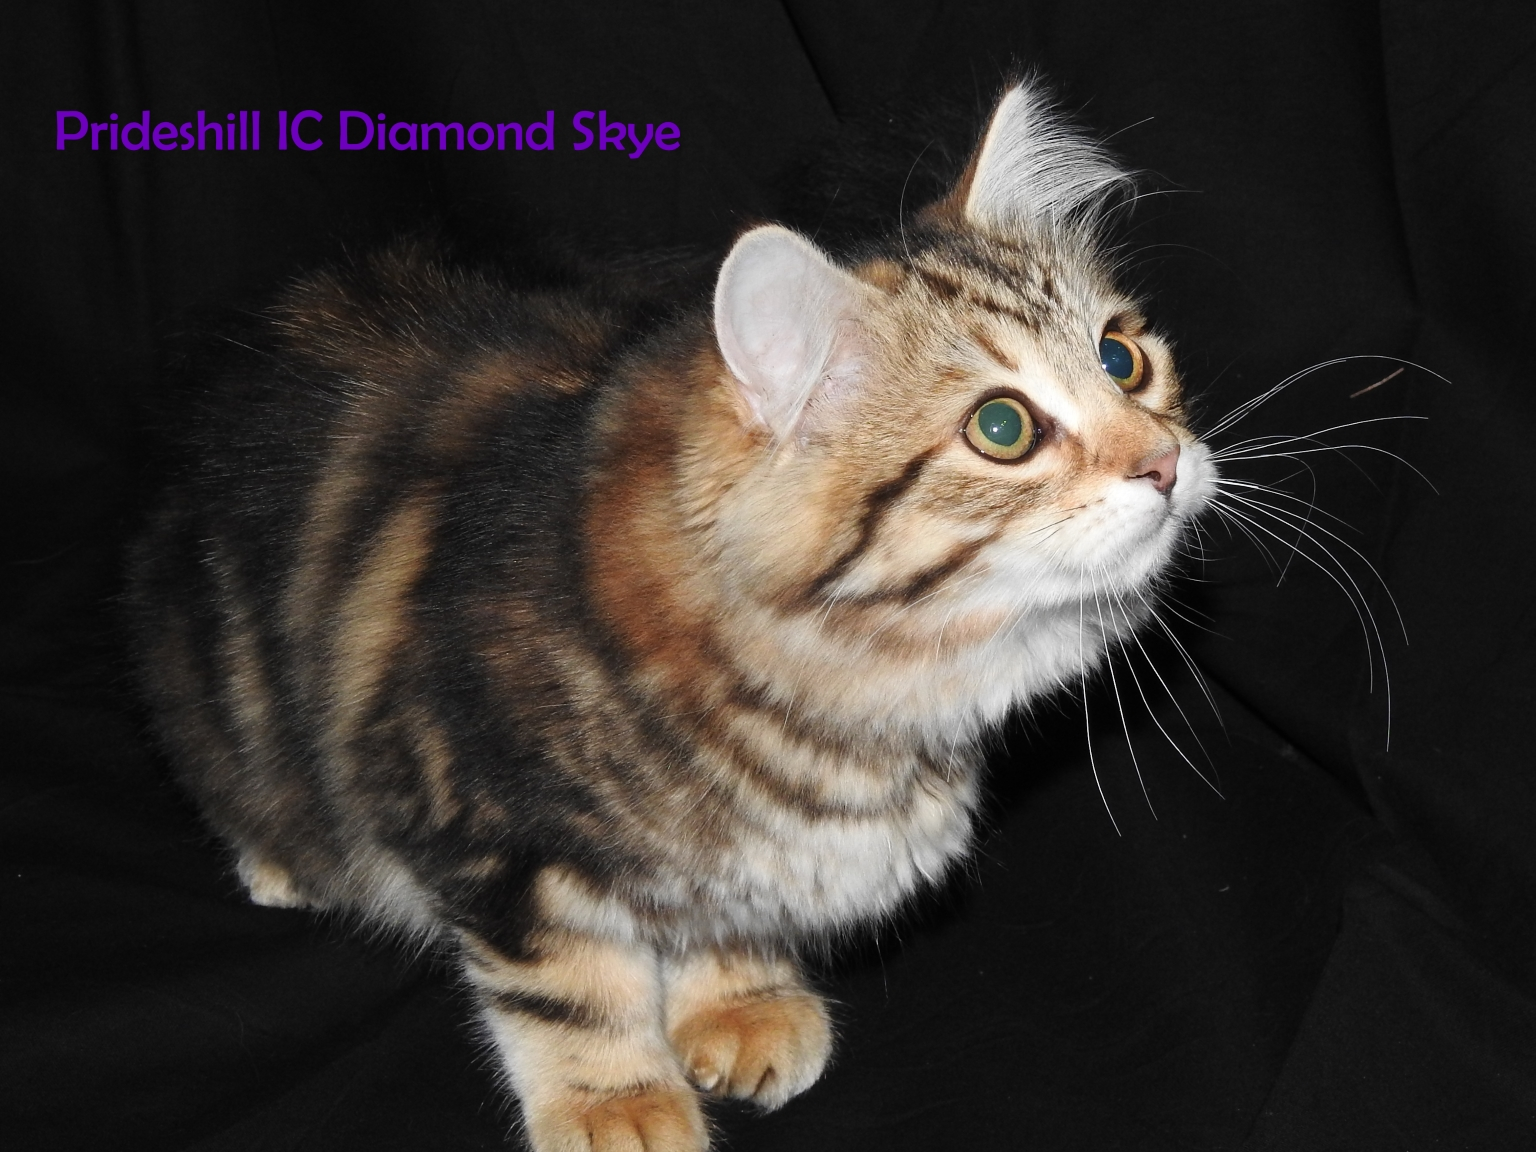 Prideshill IC Diamond Skye - 14 wks